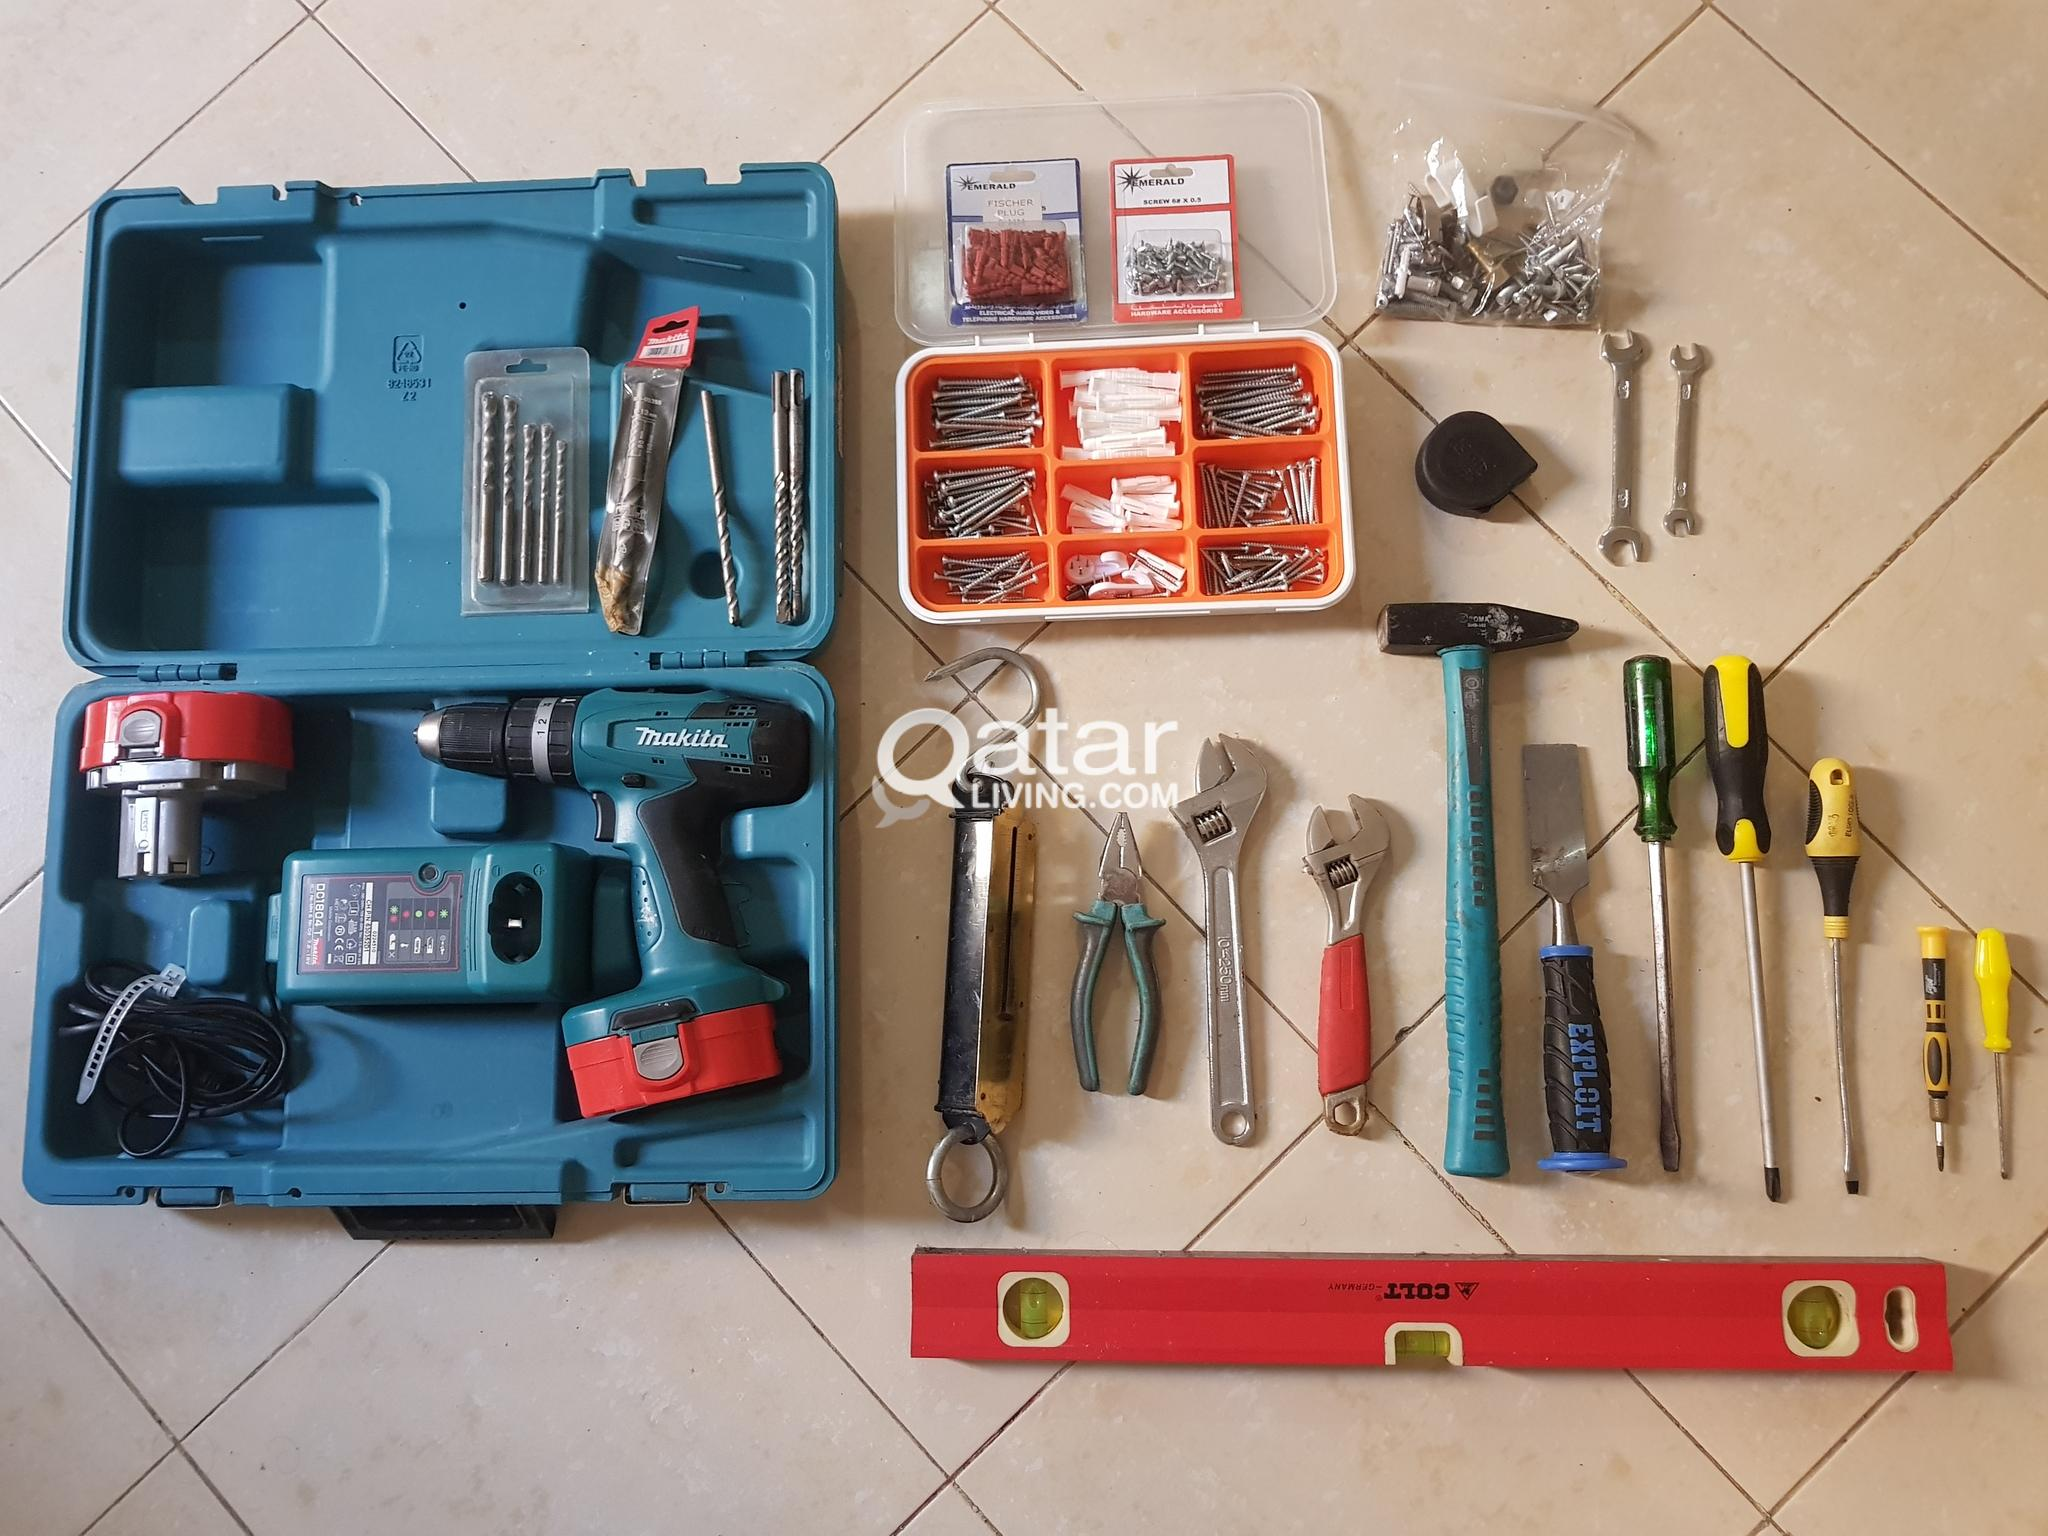 Battery Operated Hand Drill (Makita - Japan make) & Assorted